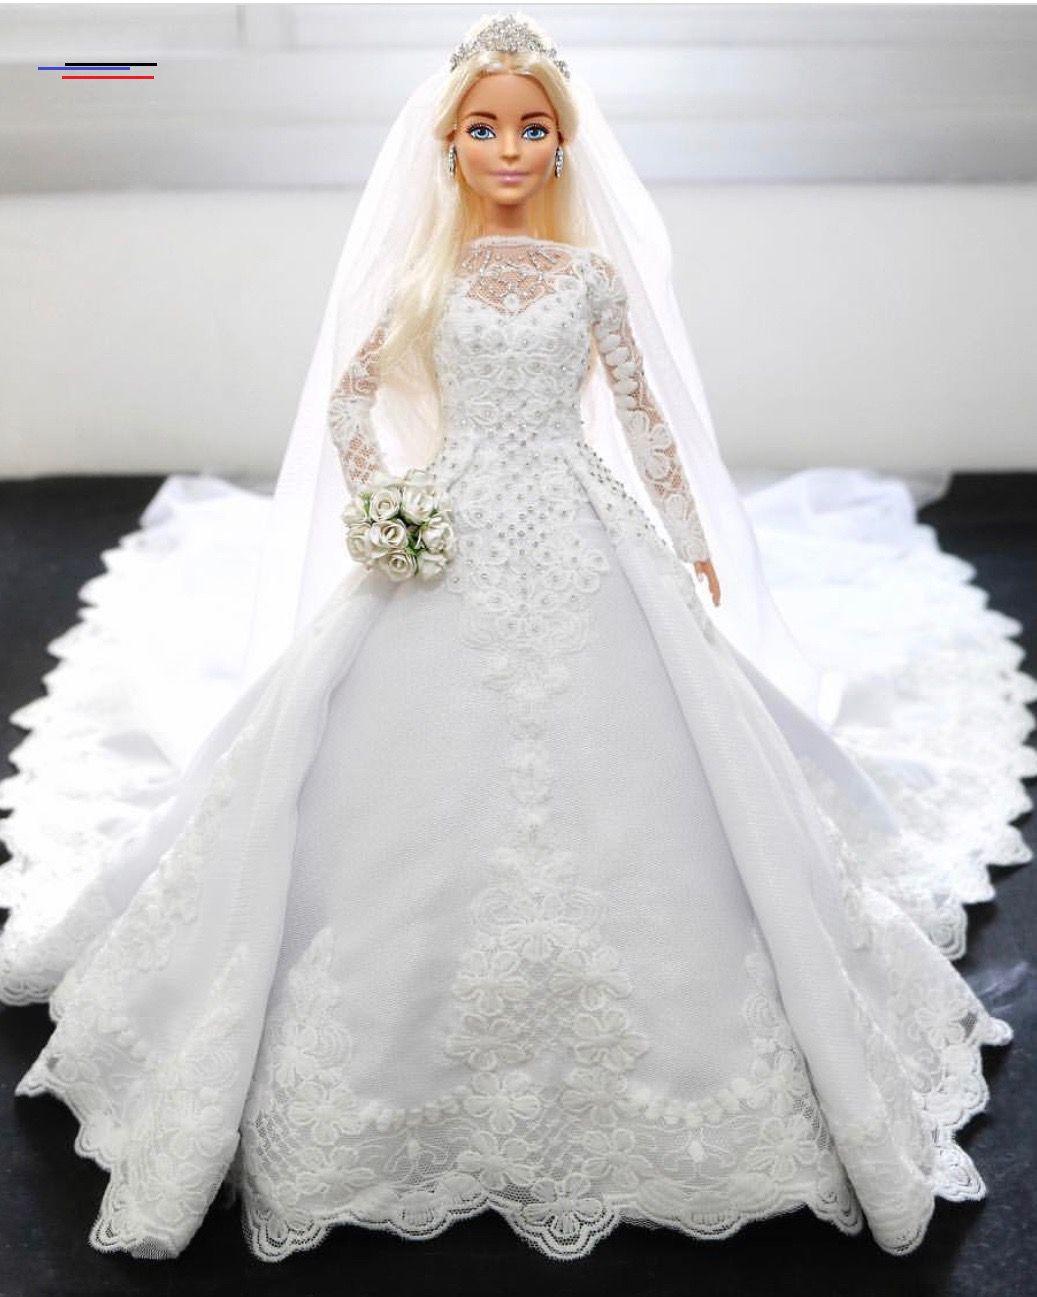 bridedolls in 19  Barbie hochzeitskleid, Barbie braut, Barbie